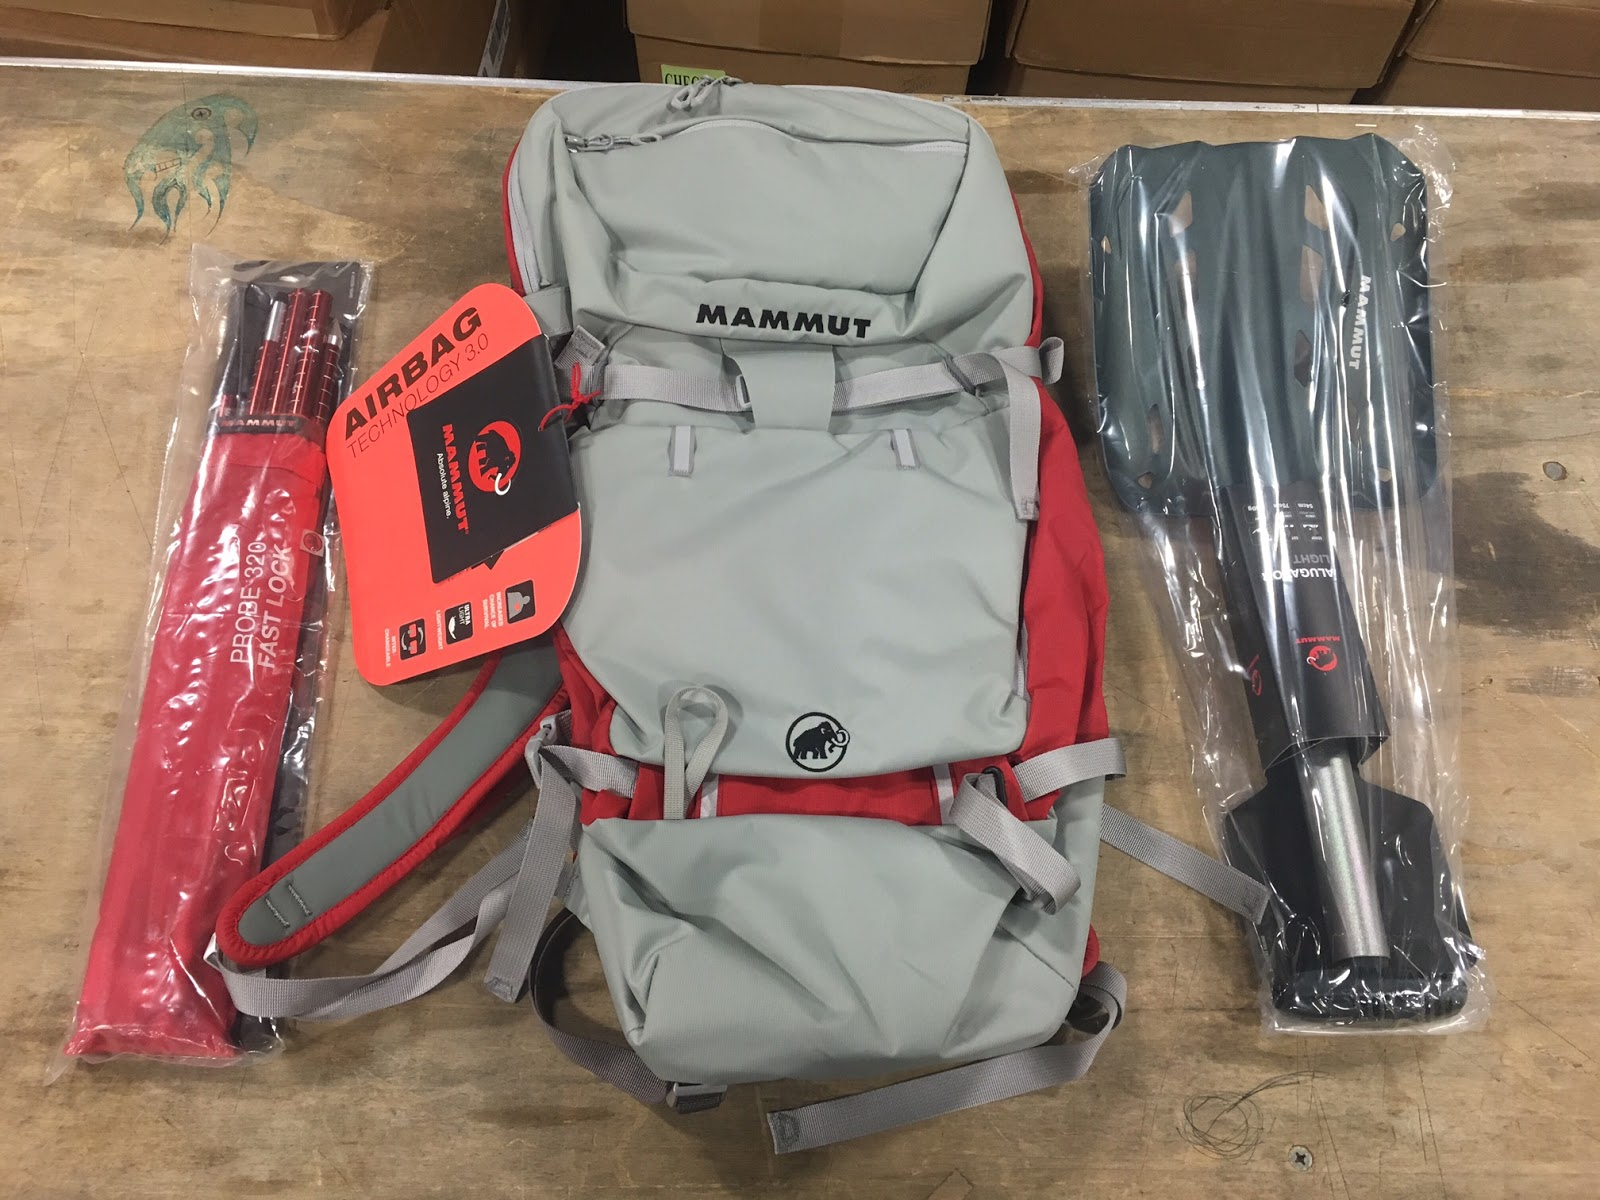 05242ebaf5 Mammut Avalanche Safety  Mammut s Light Removable Airbag 3.0--the ...